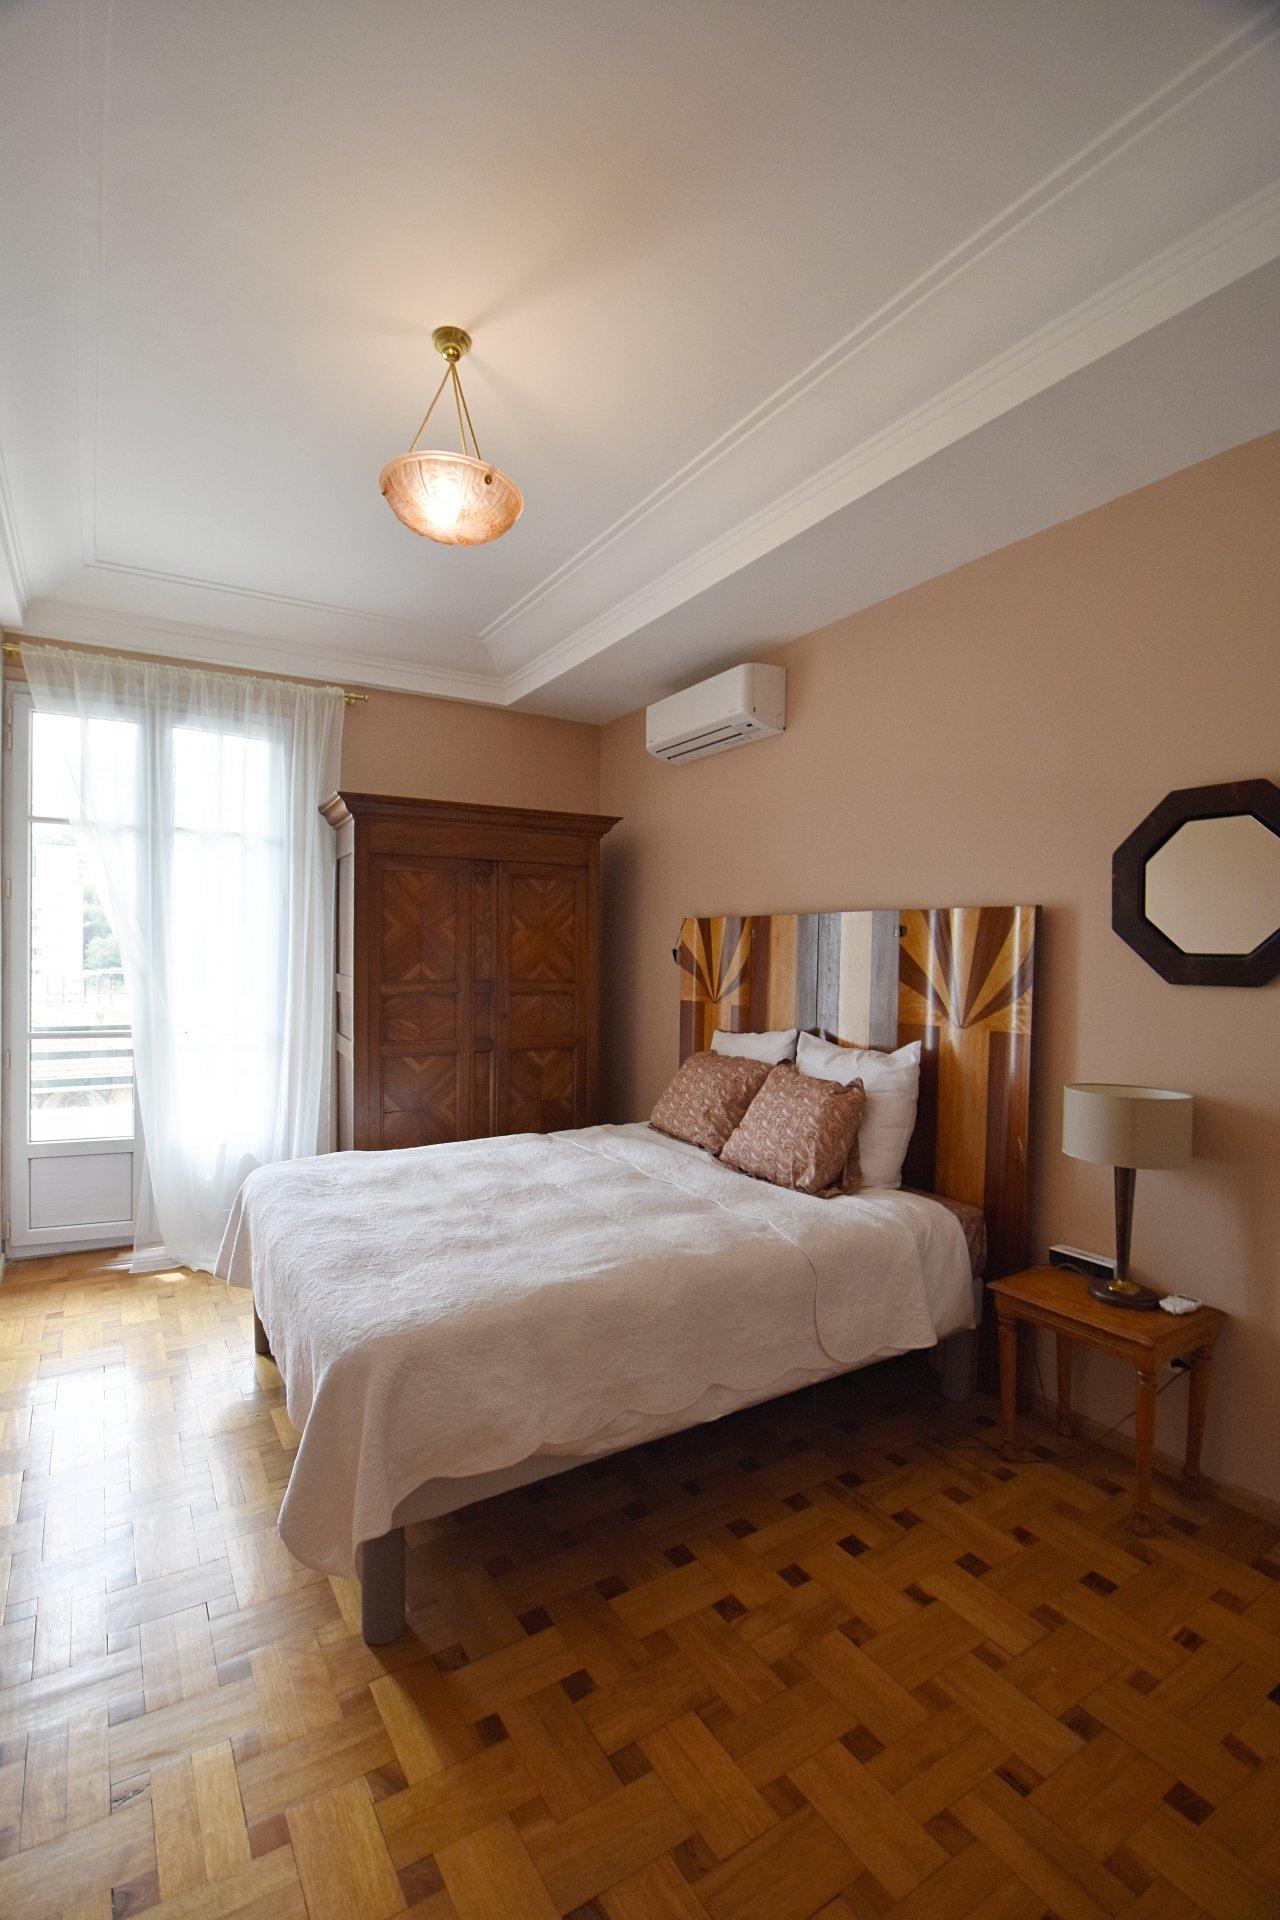 Seasonal rental Apartment - Nice